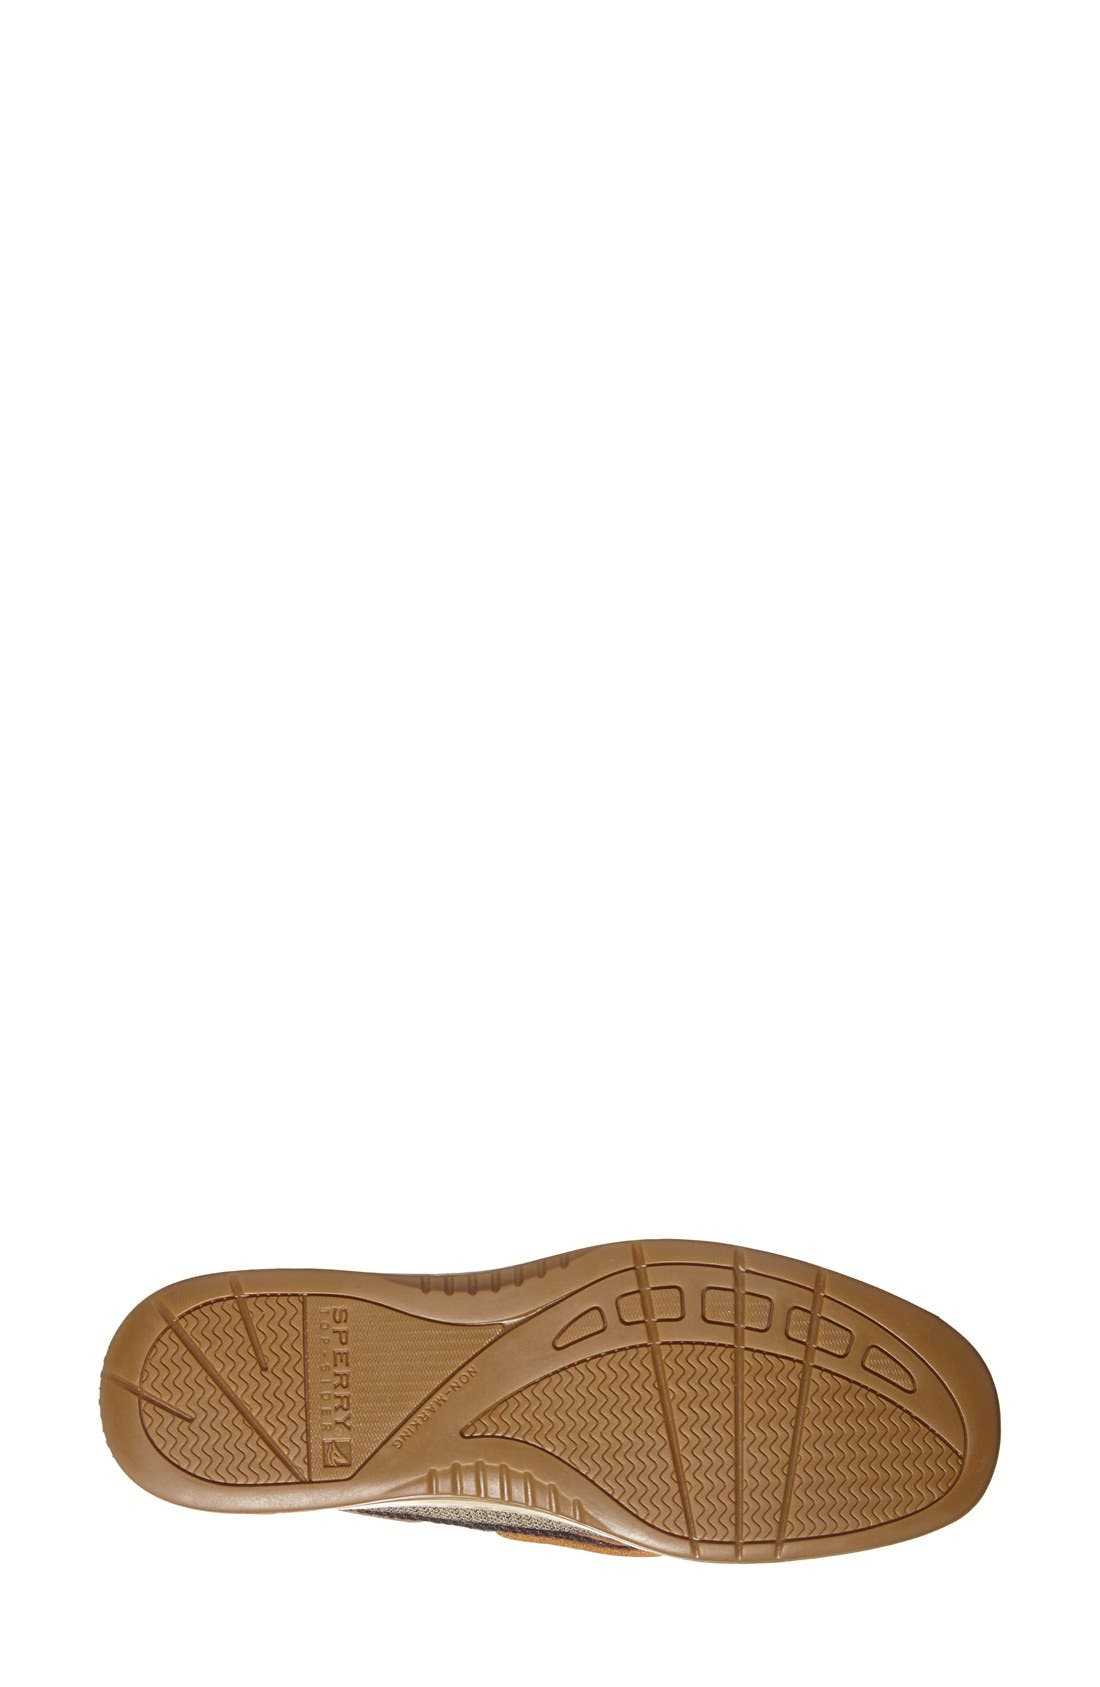 Alternate Image 3  - Sperry Top-Sider® 'Angelfish' Boat Shoe (Women)